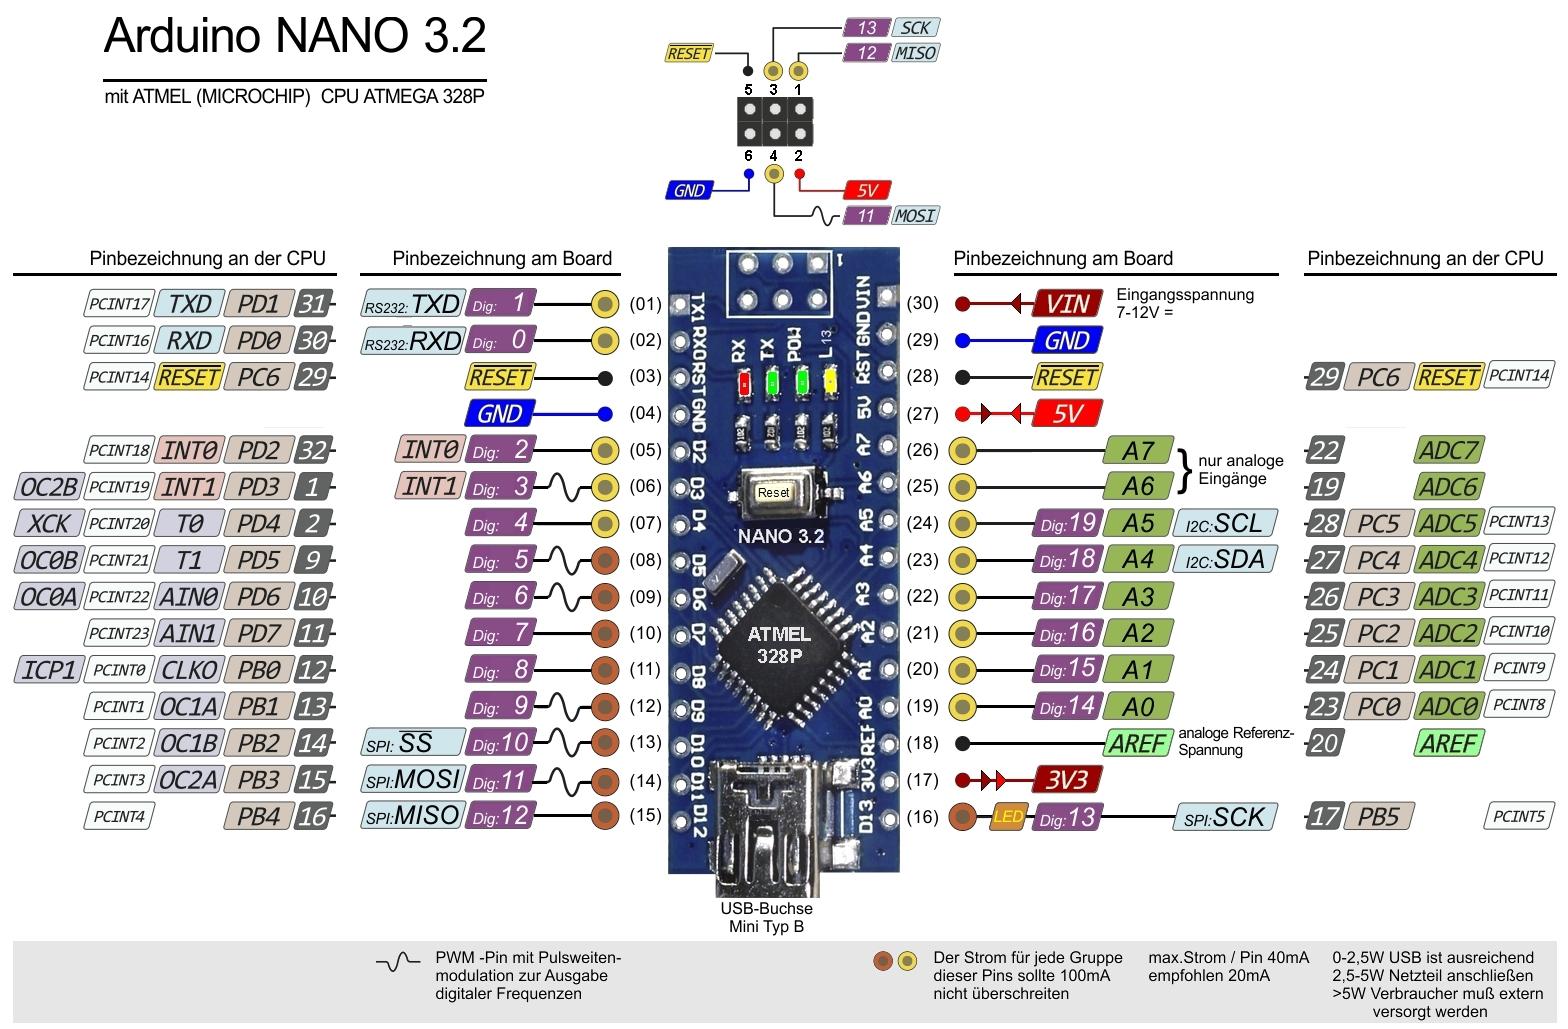 arduino nano mit gps modul neo 6m. Black Bedroom Furniture Sets. Home Design Ideas